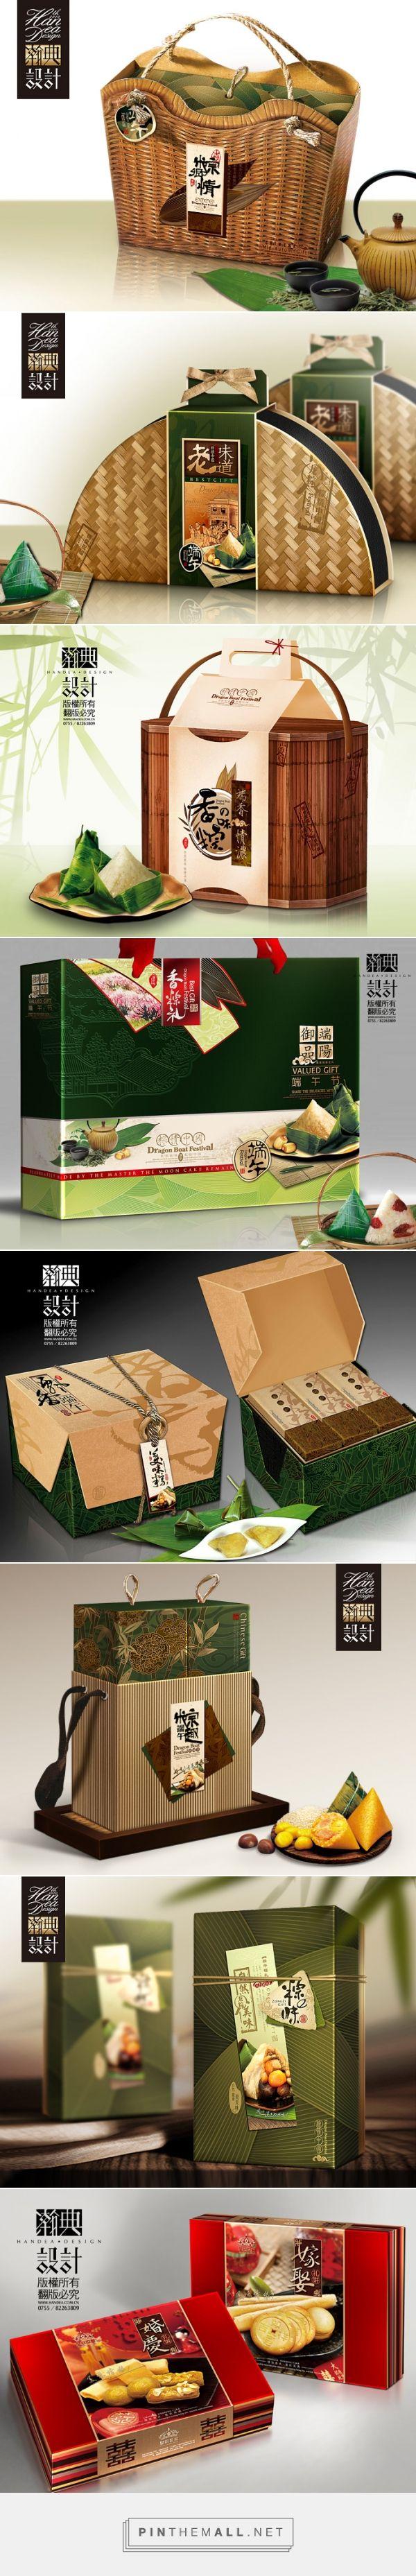 食品包装-快销食品包装设计-优秀包装展品-包联网-中国包装设计与包装制品门户网 Curated by Packaging Diva PD beautiful Dragon Boat Festival packaging designs PD created via http://s.pkg.cn/00021/21418.htm